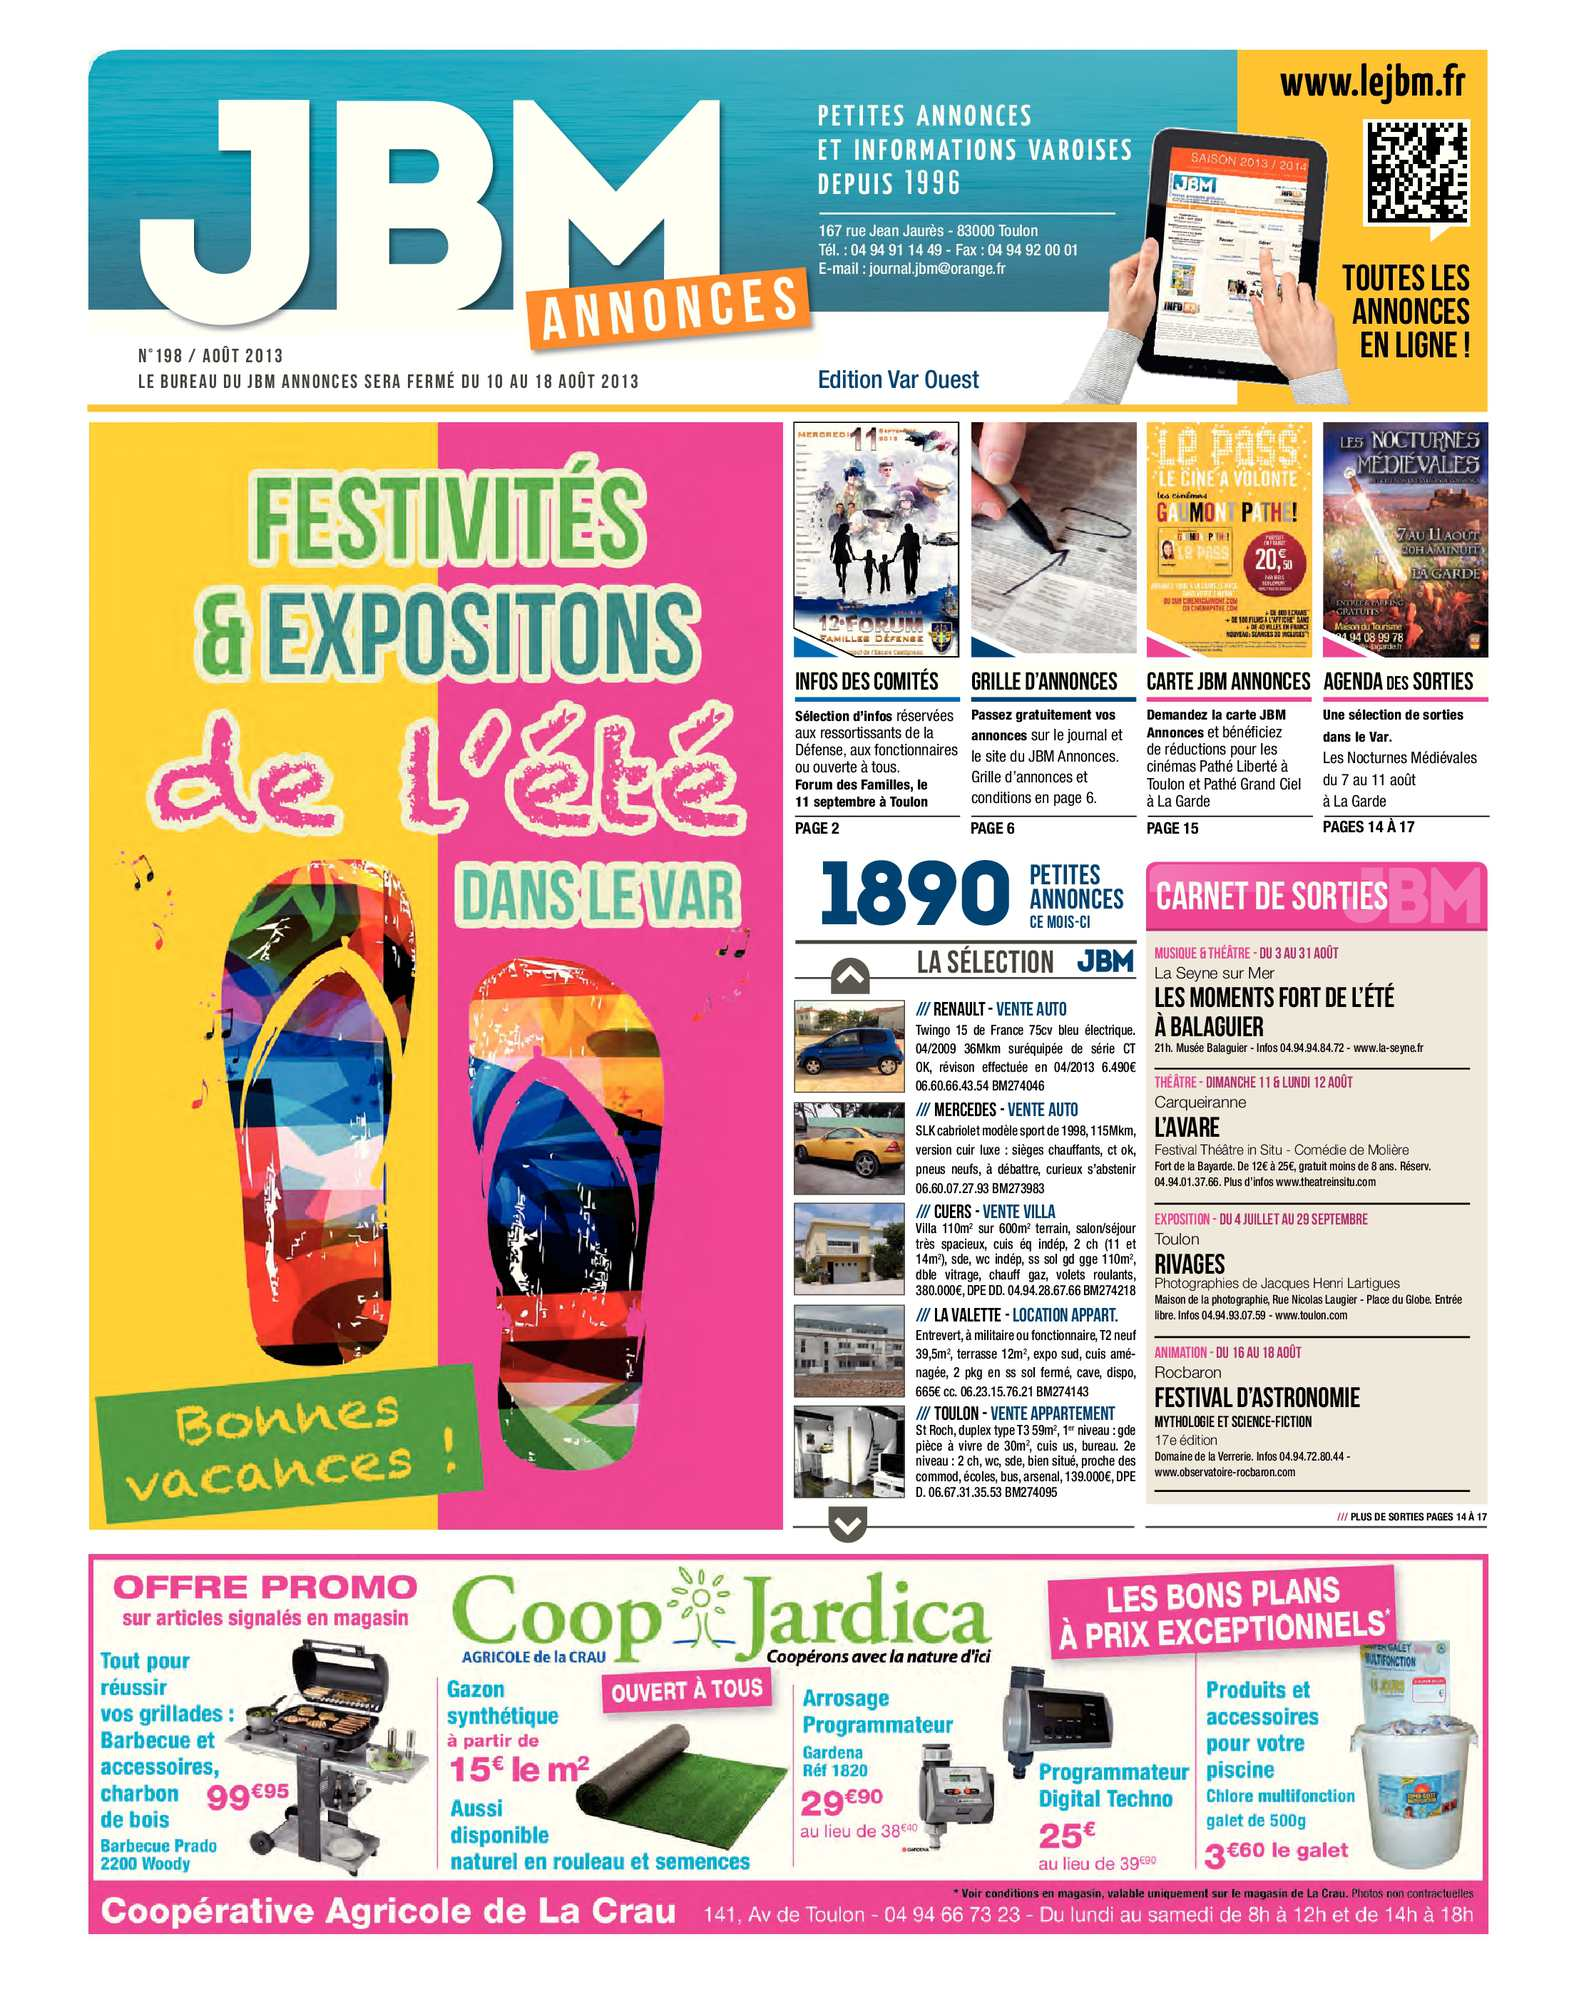 Journal 2013 Jbm N°198 Annonces Août Calaméo dawxUqOnYq